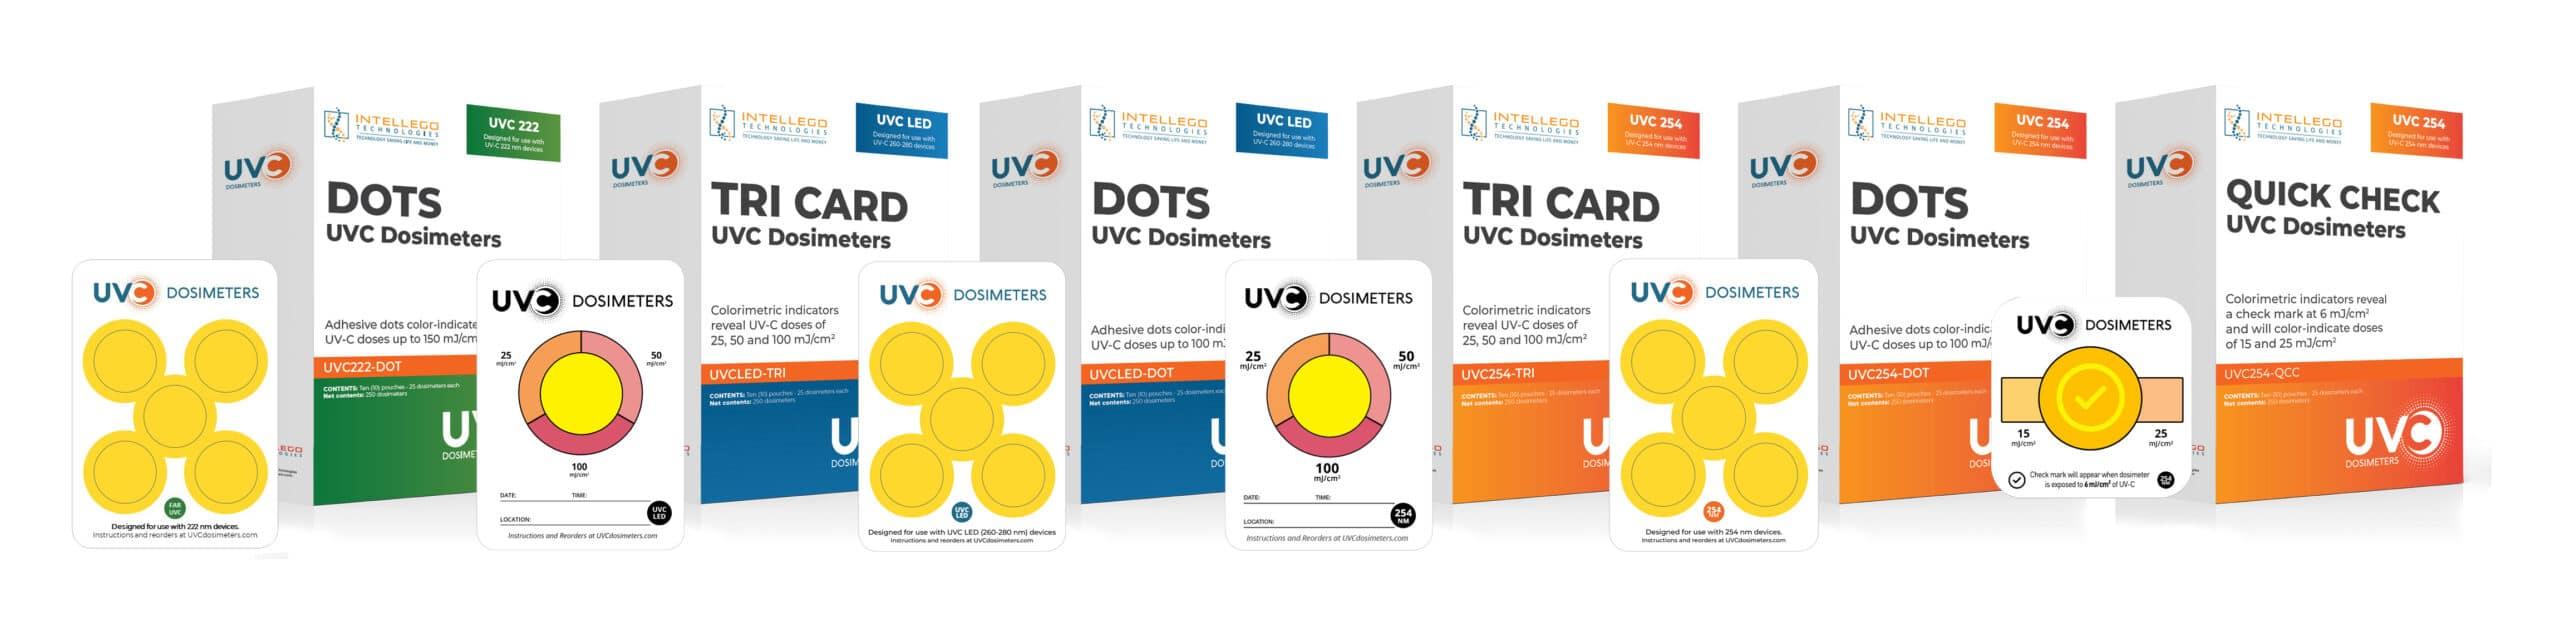 UVC Dosimeters from Intellego Technologies